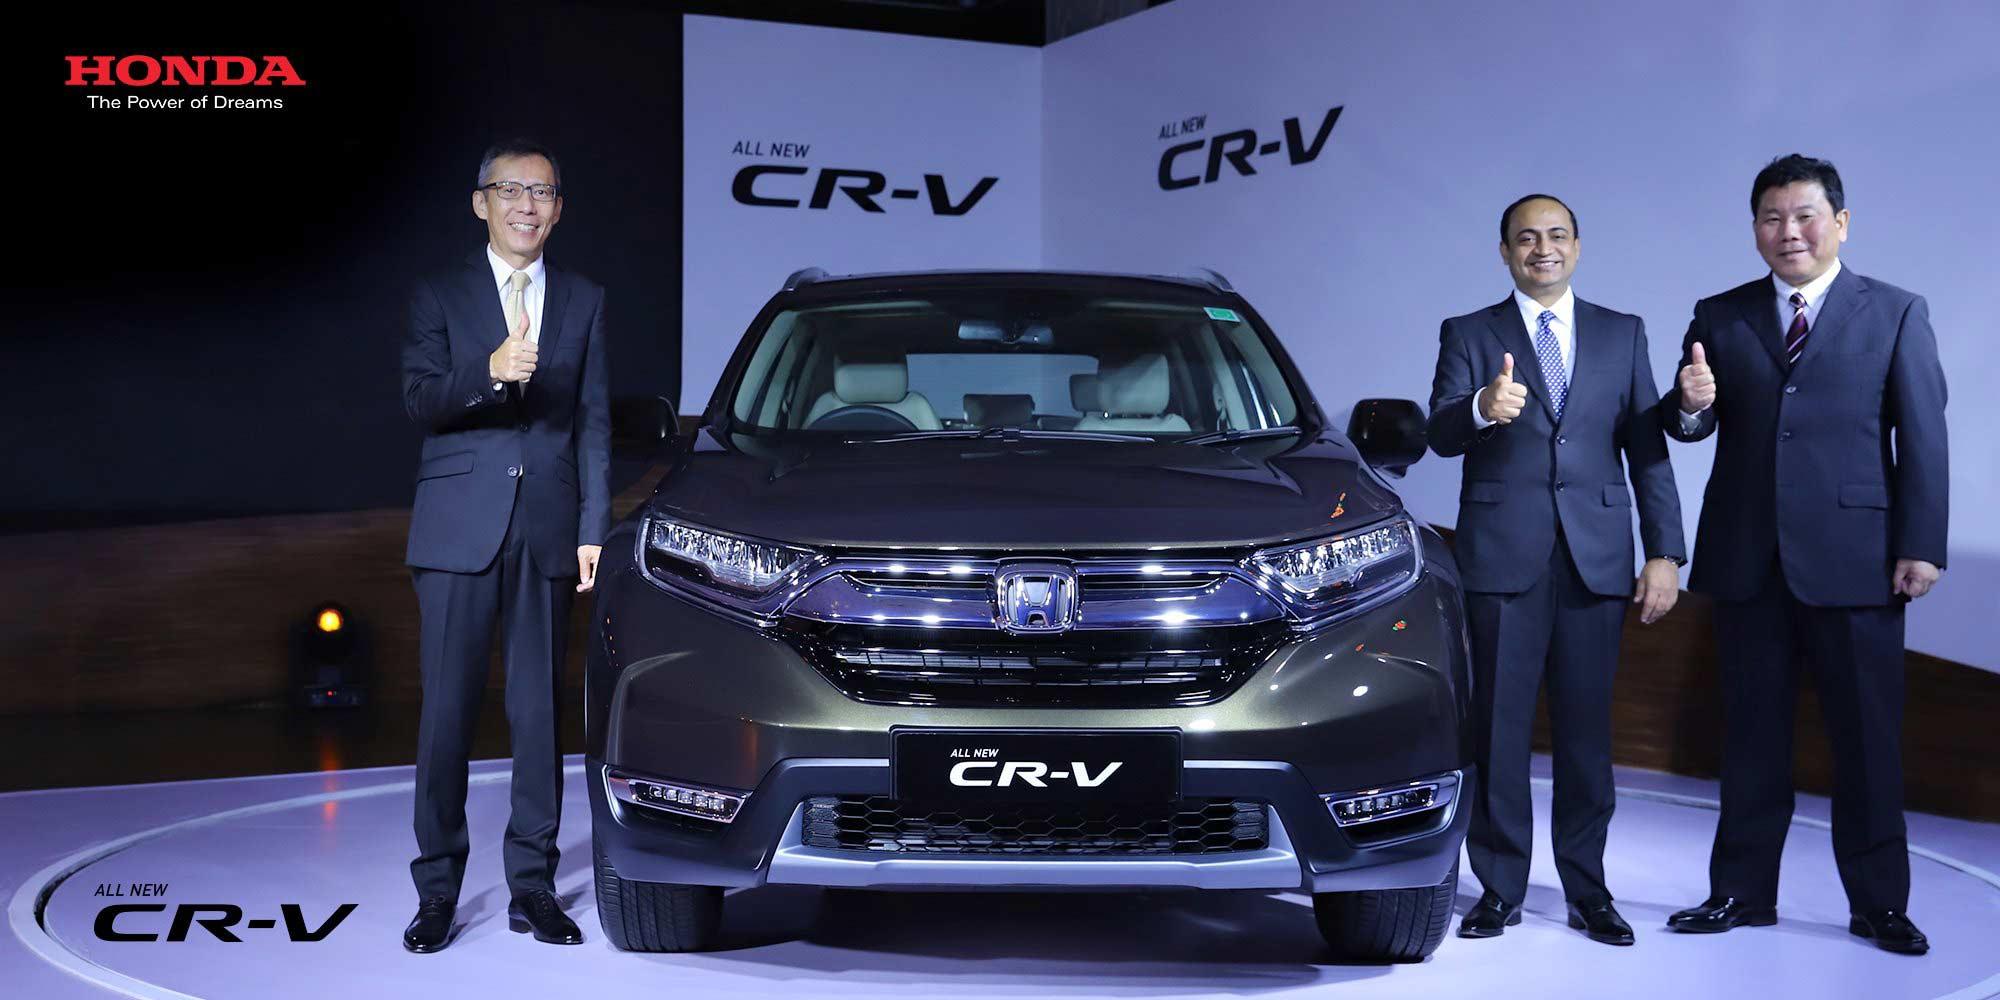 2018-5th-generation-Honda-CR-V-India-launch